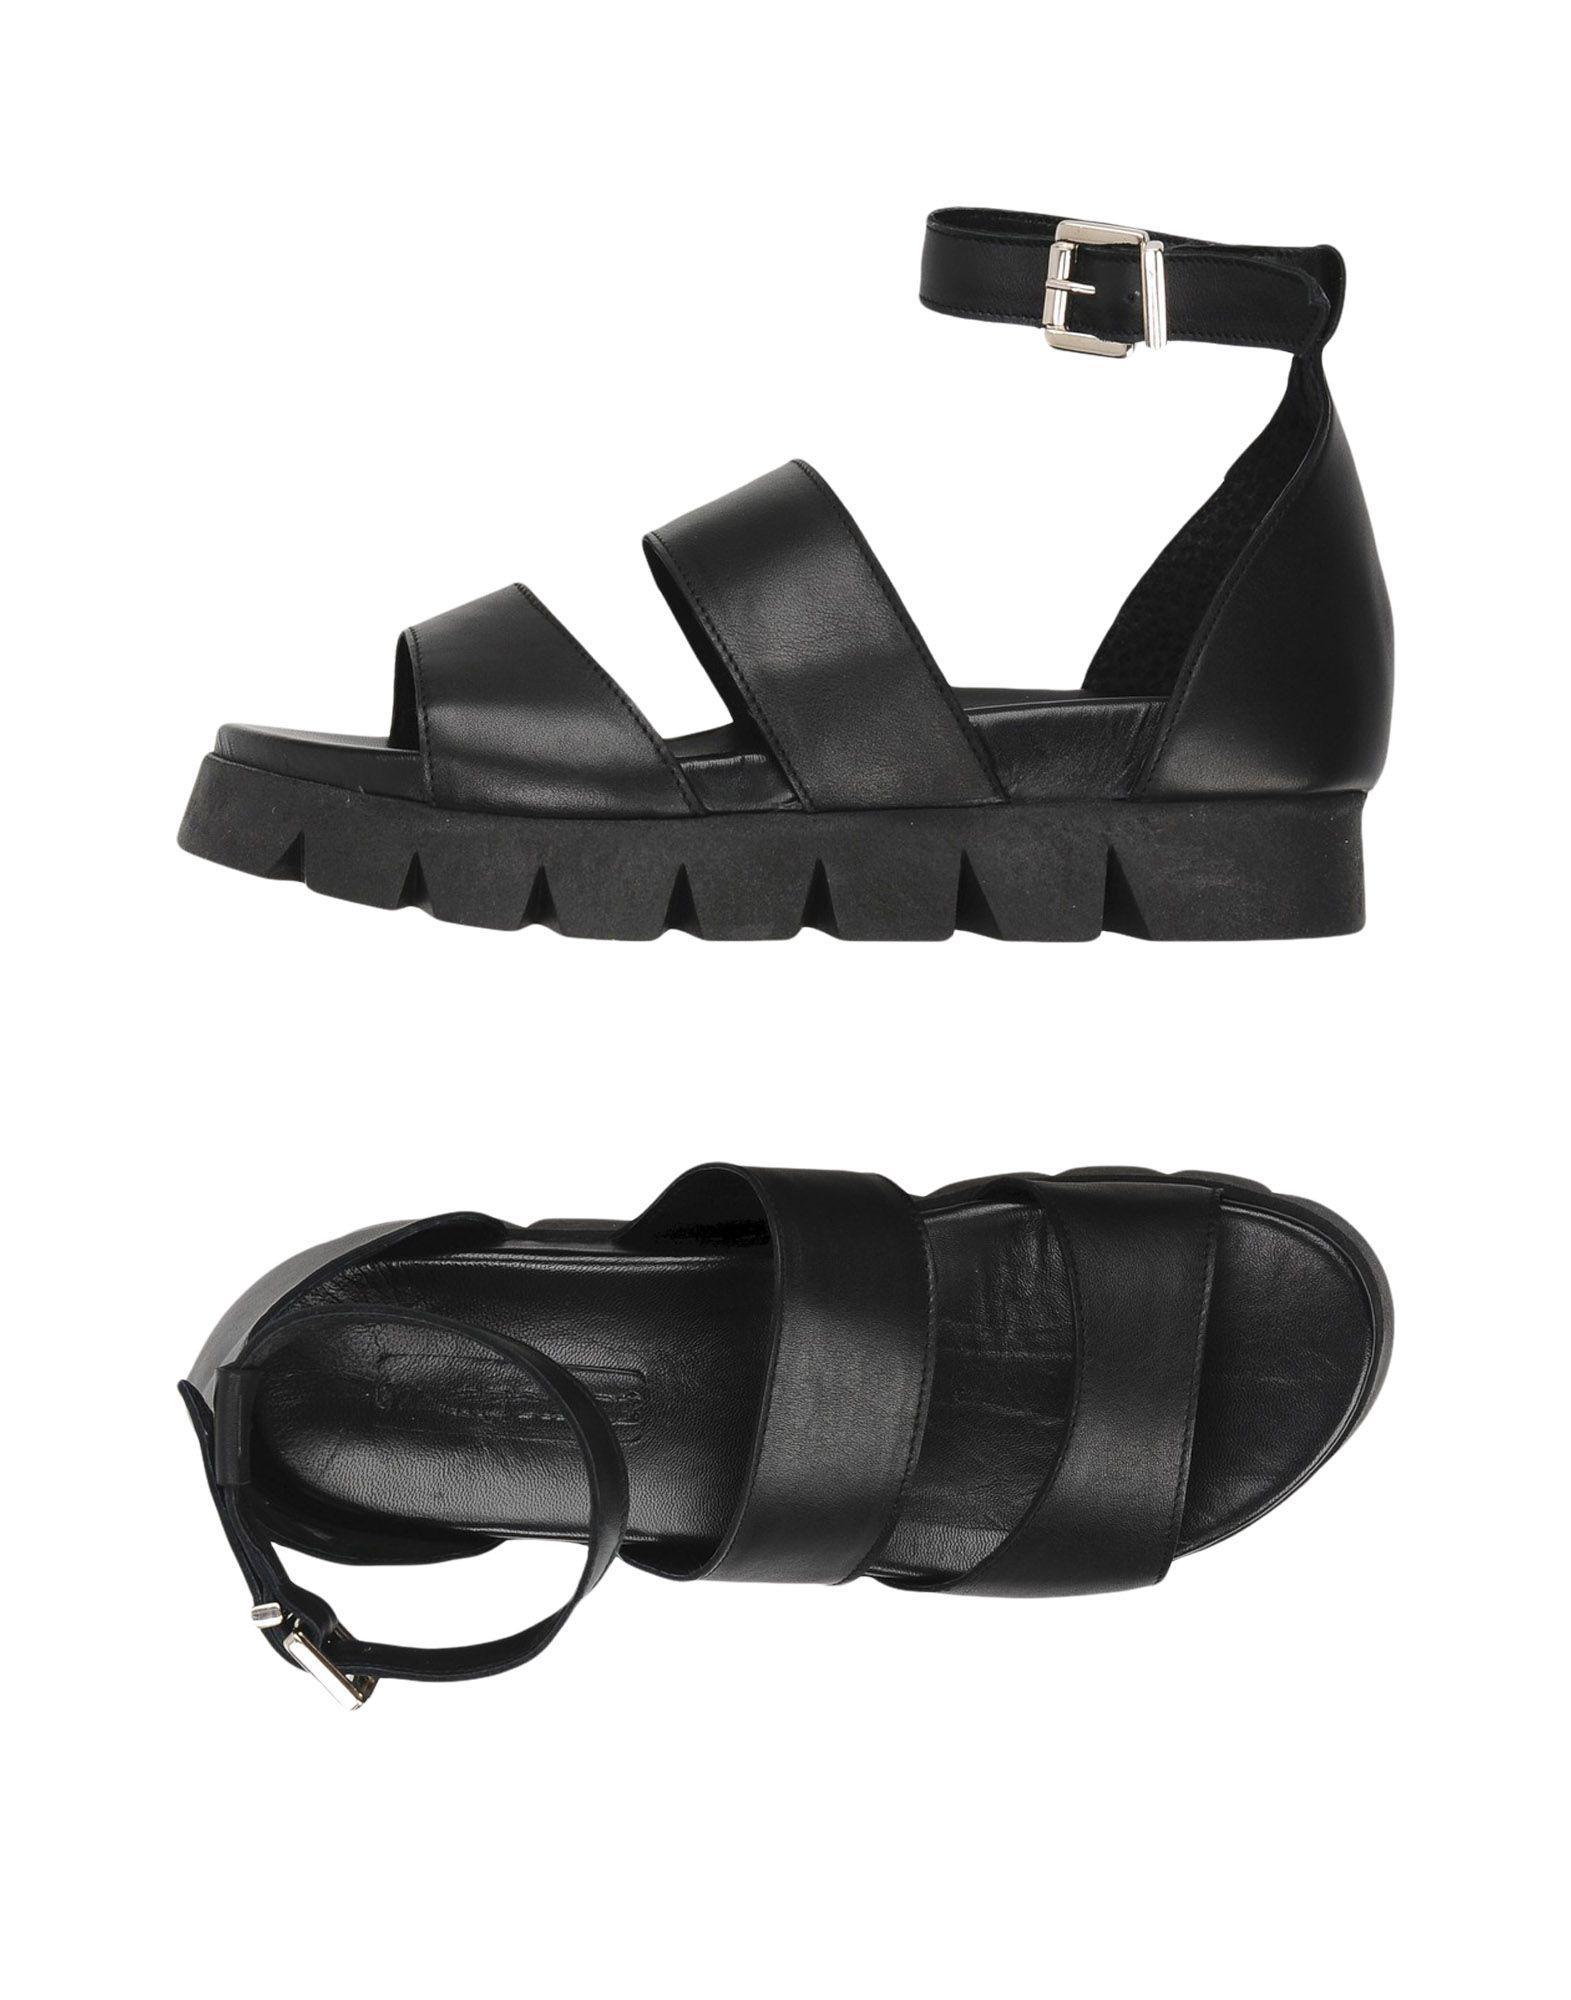 Sandals Lyst In Black Pierre Darre' 5p6nfqUwA